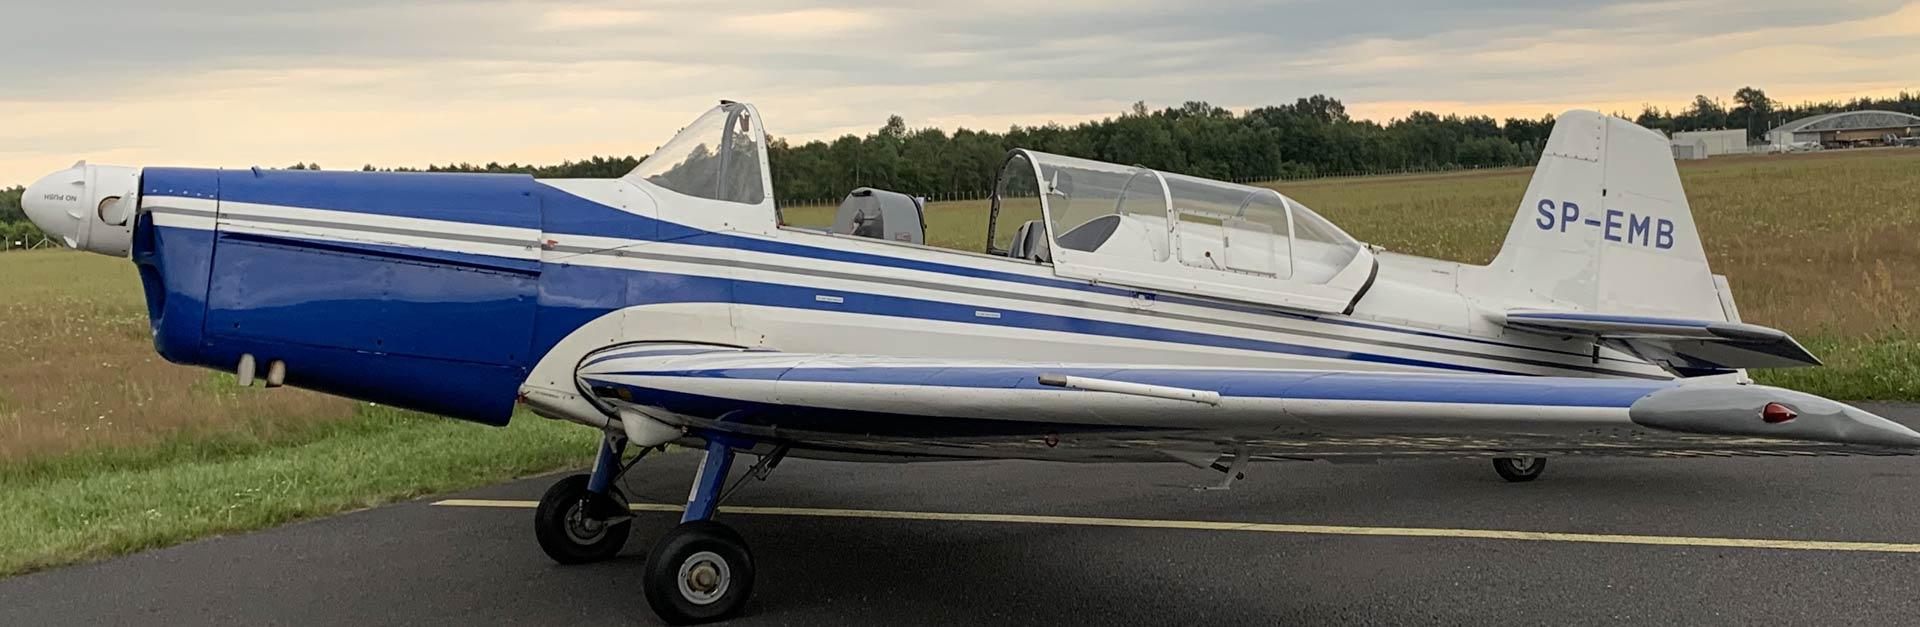 ZLIN 526F SP-EMB